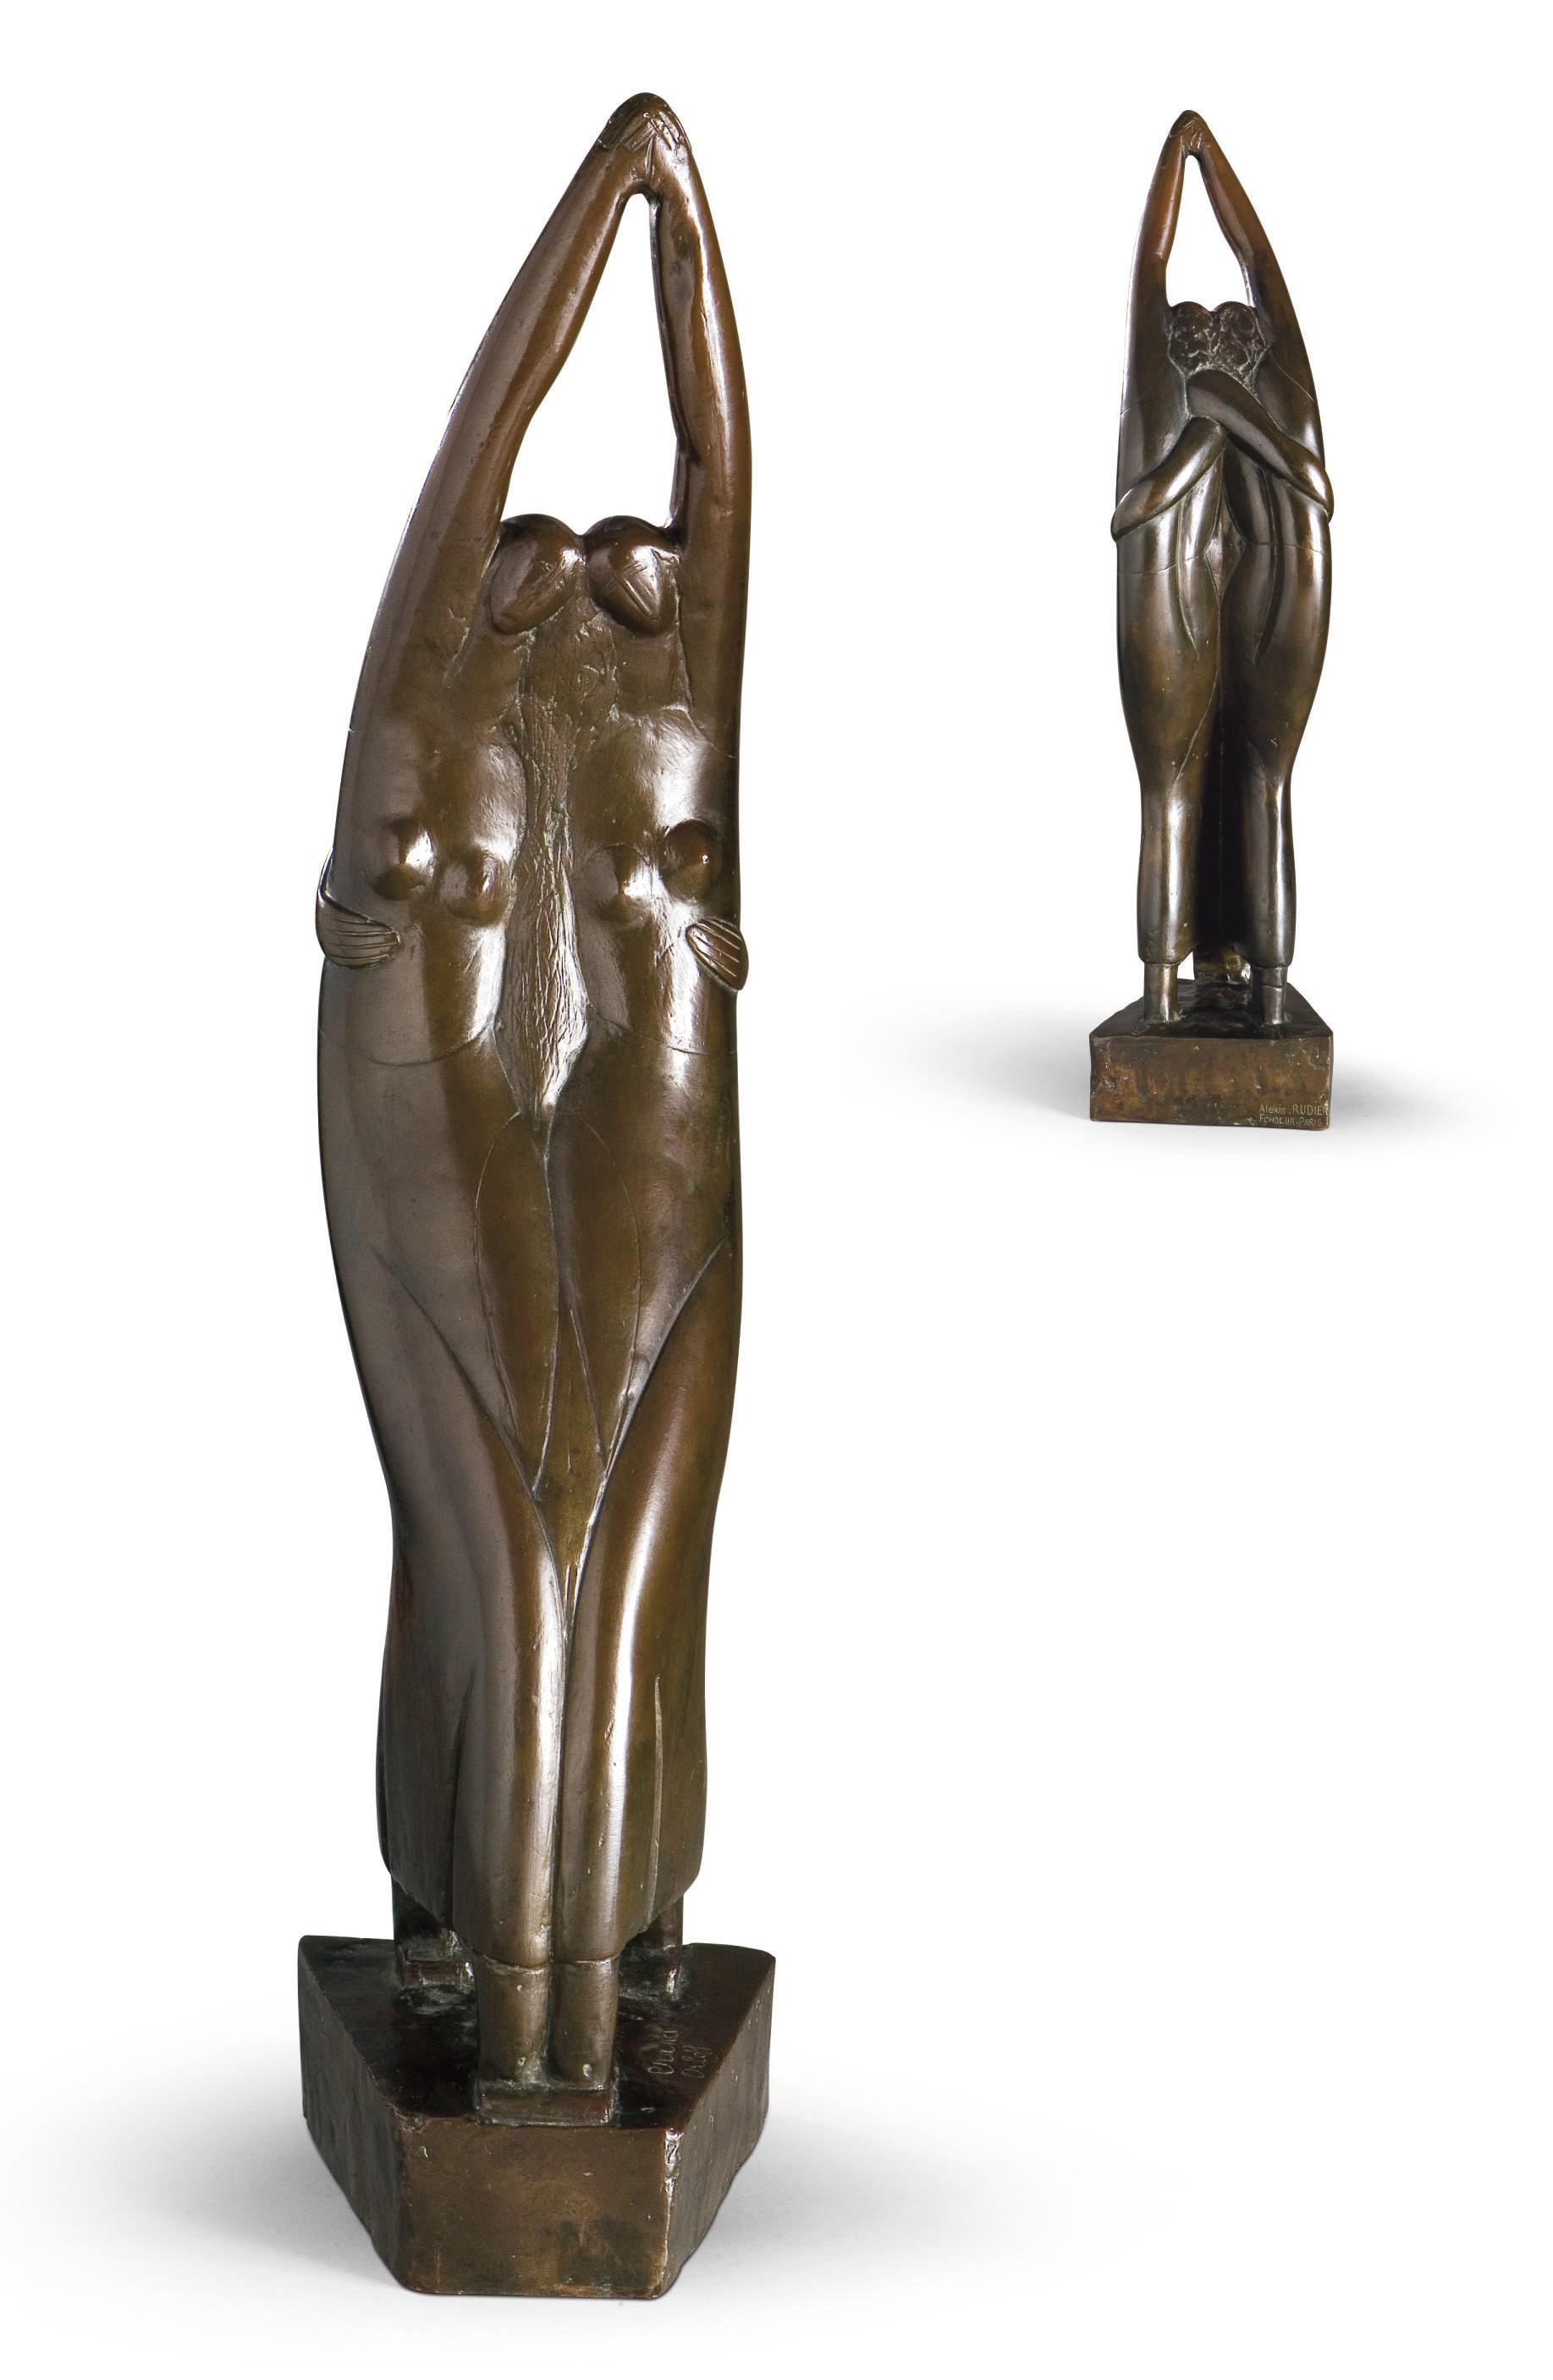 CHANA ORLOFF (1888-1969)